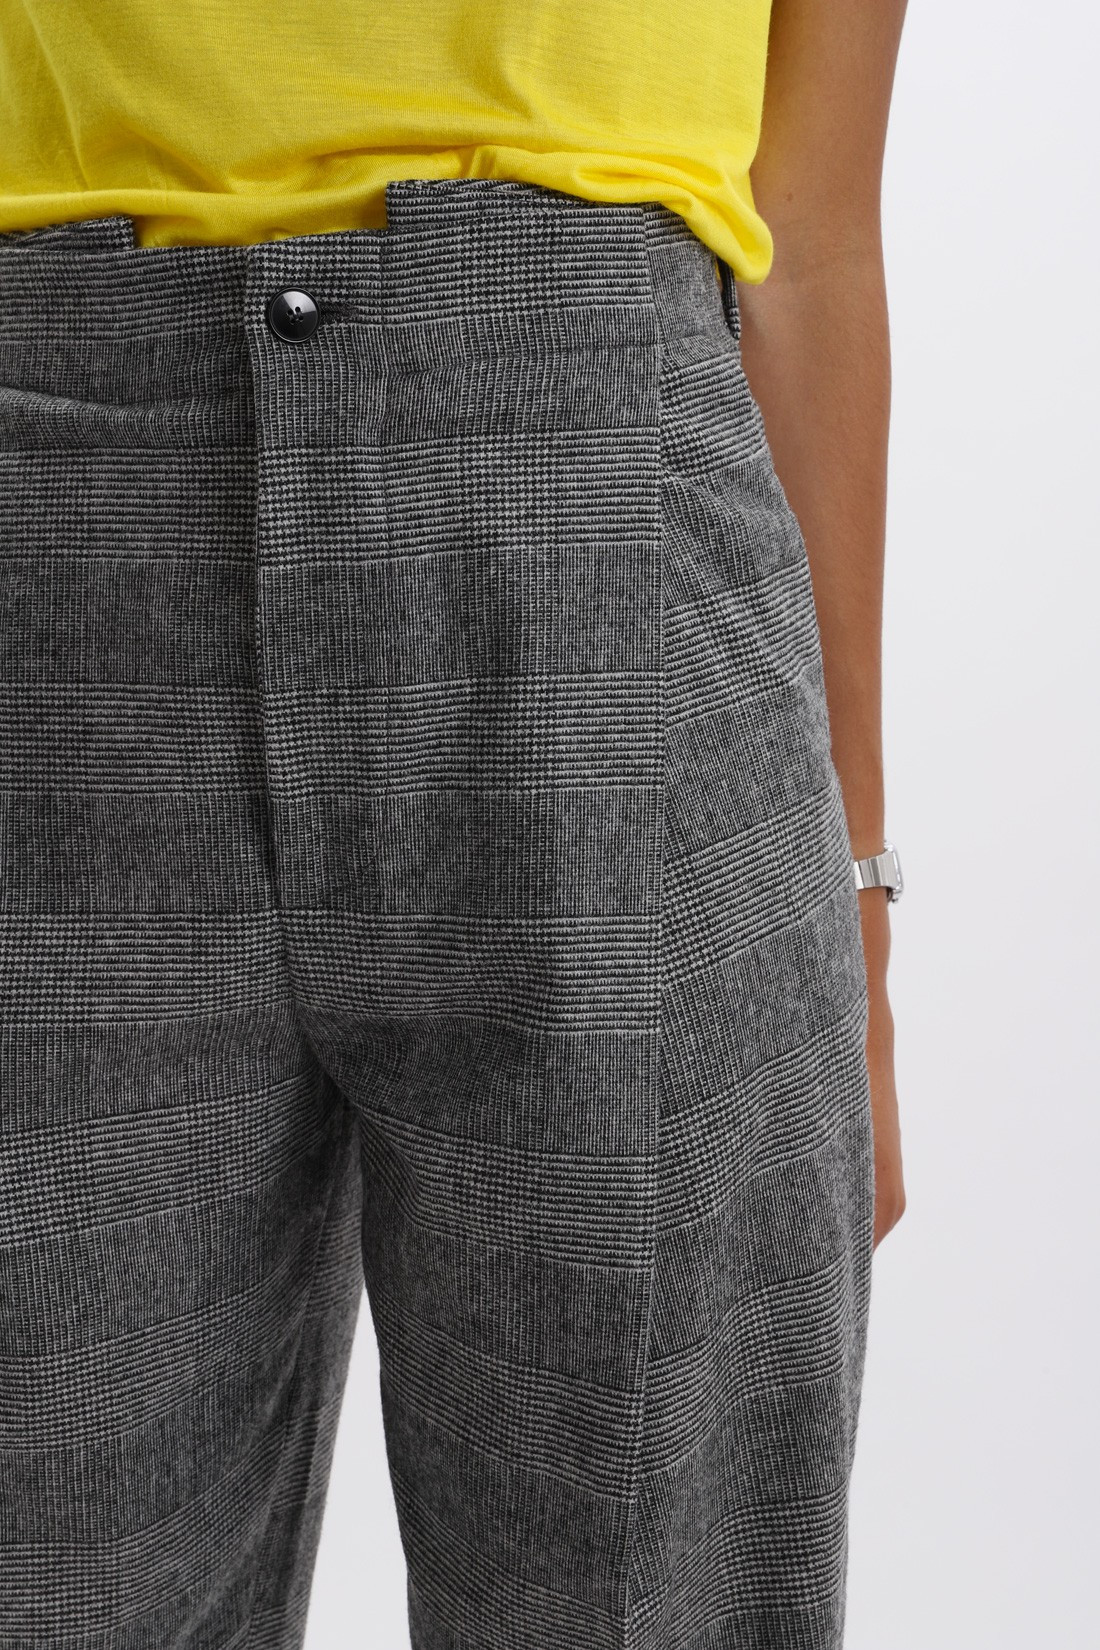 BARENA FOR WOMAN / Pantalone vittoria Zani